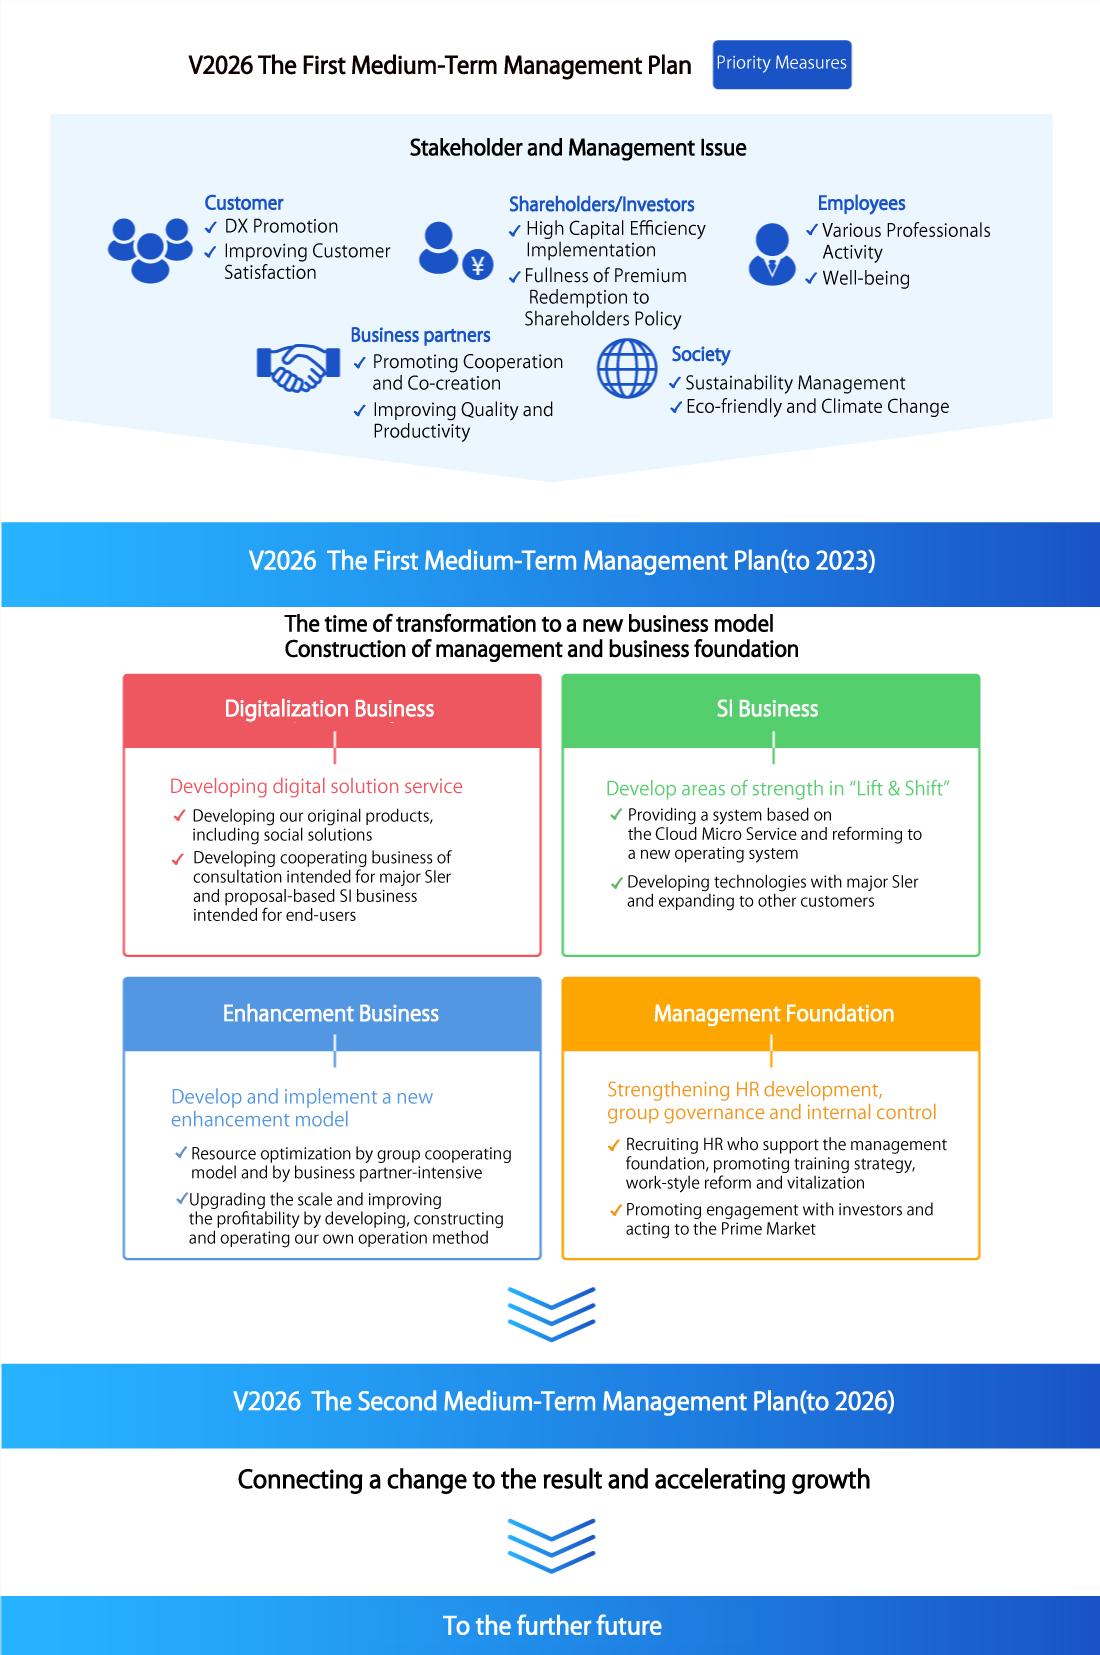 VISION 2026 第1次中期経営計画-重点施策-